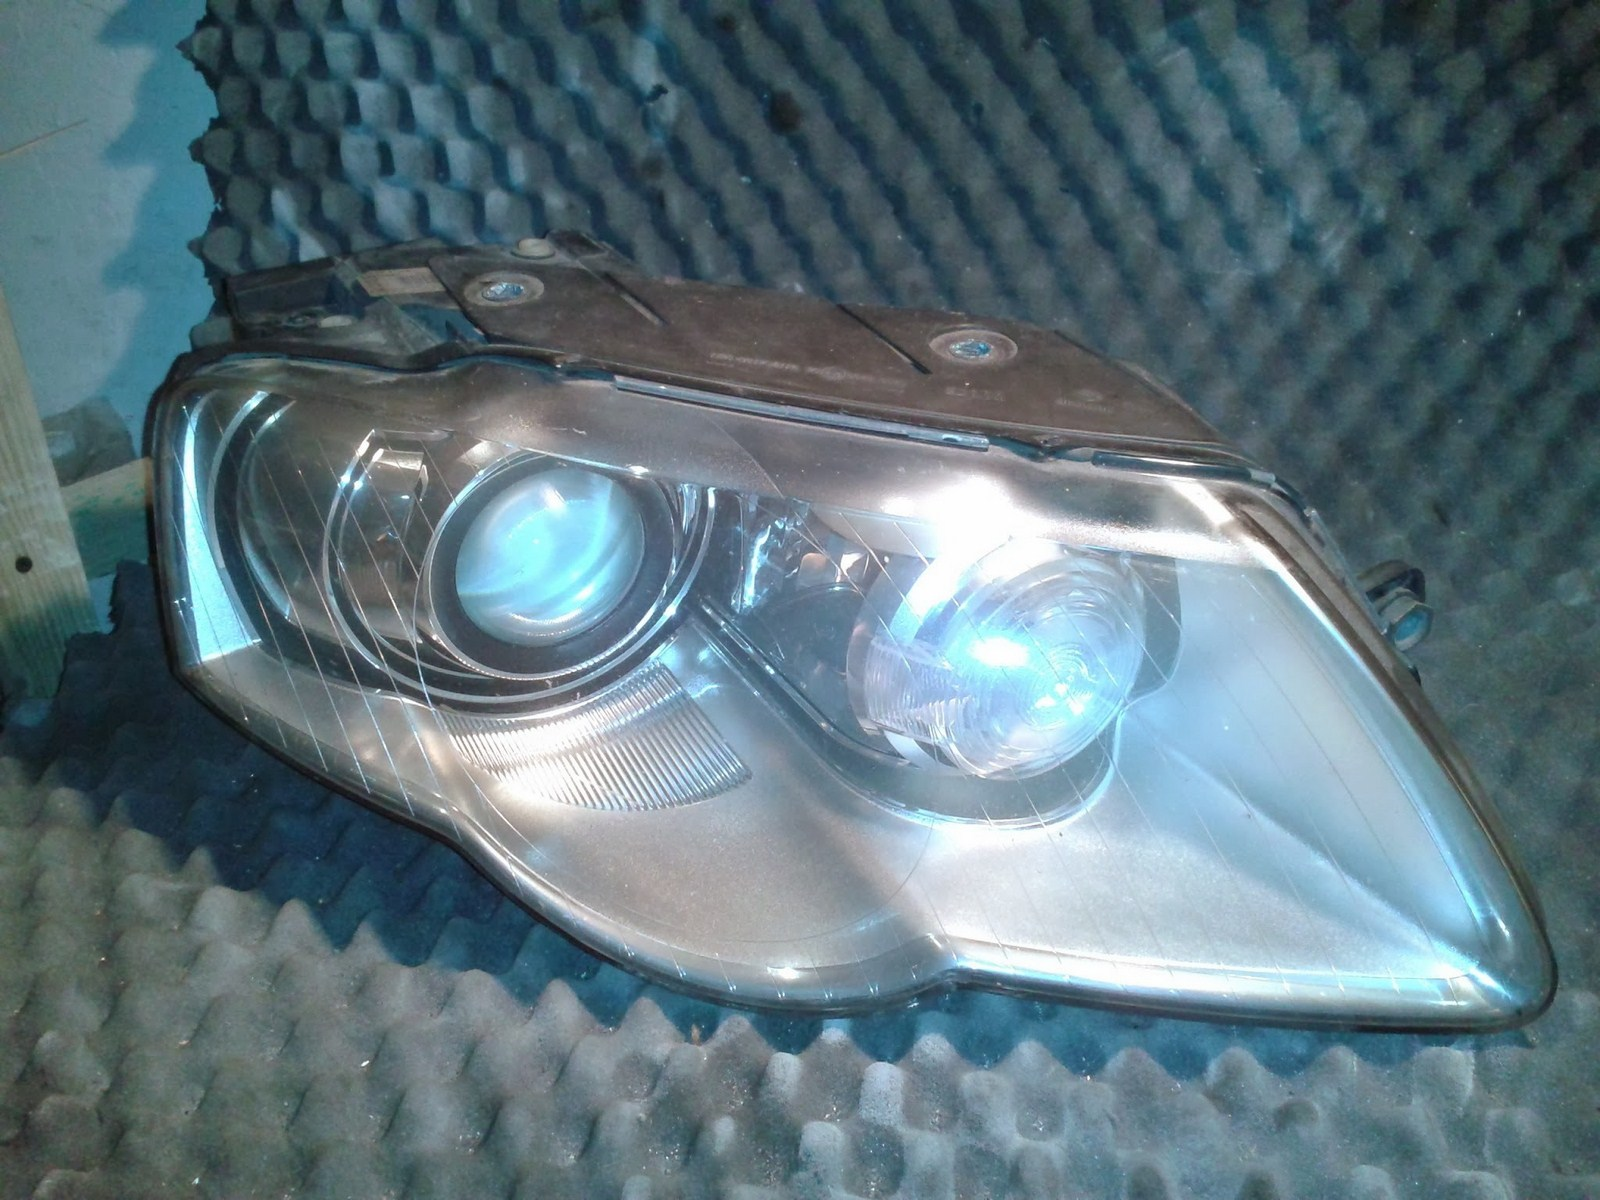 Vw Passat B6 Lampa Przednia Prawa Xenon Reflektor Naprawa I